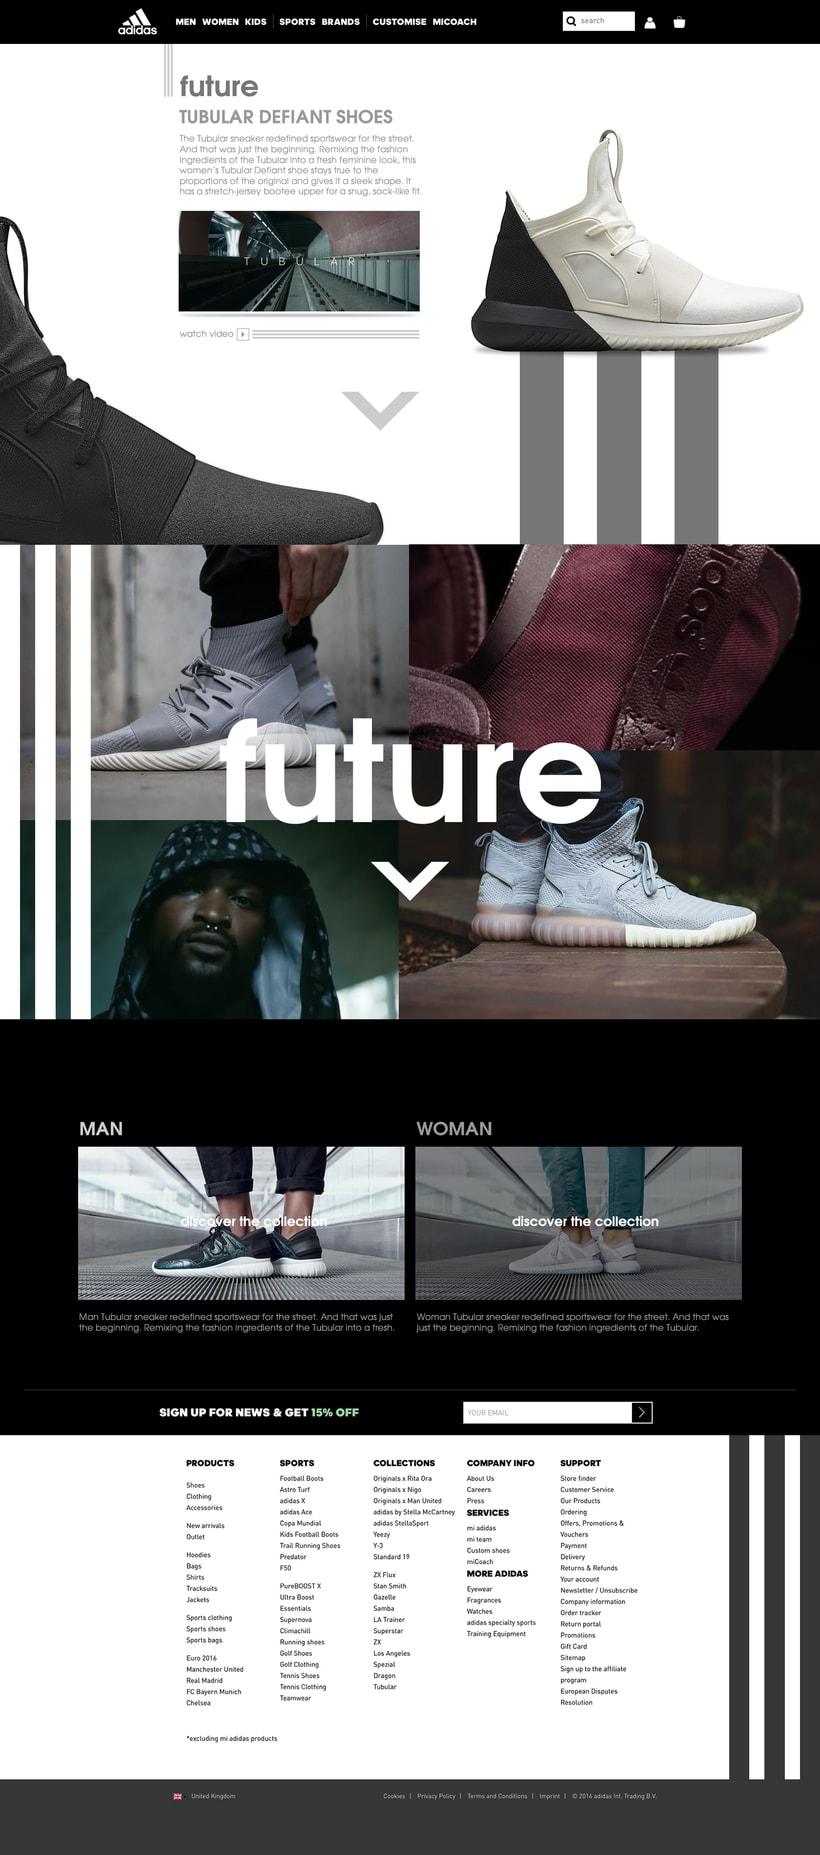 Adidas Tubular - Future 0